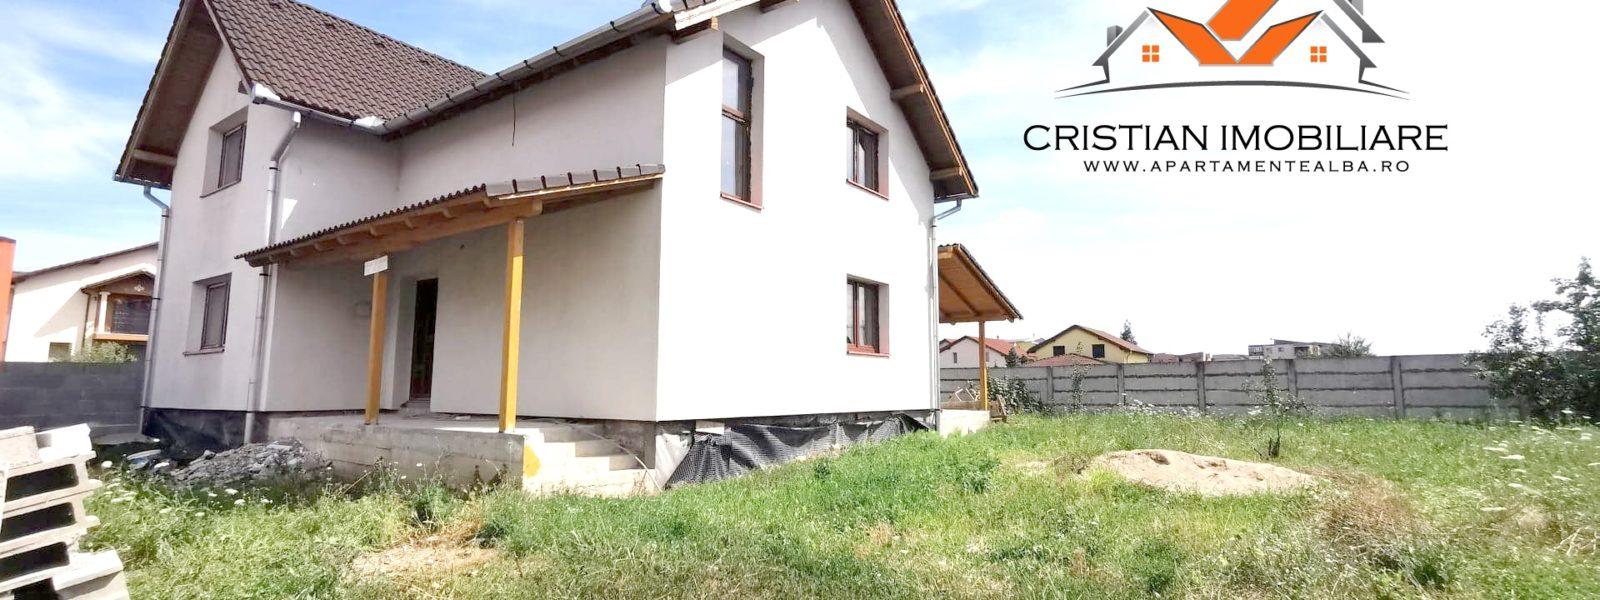 Casa noua individuala, Alba-Iulia, zona Ampoi 3 !!!